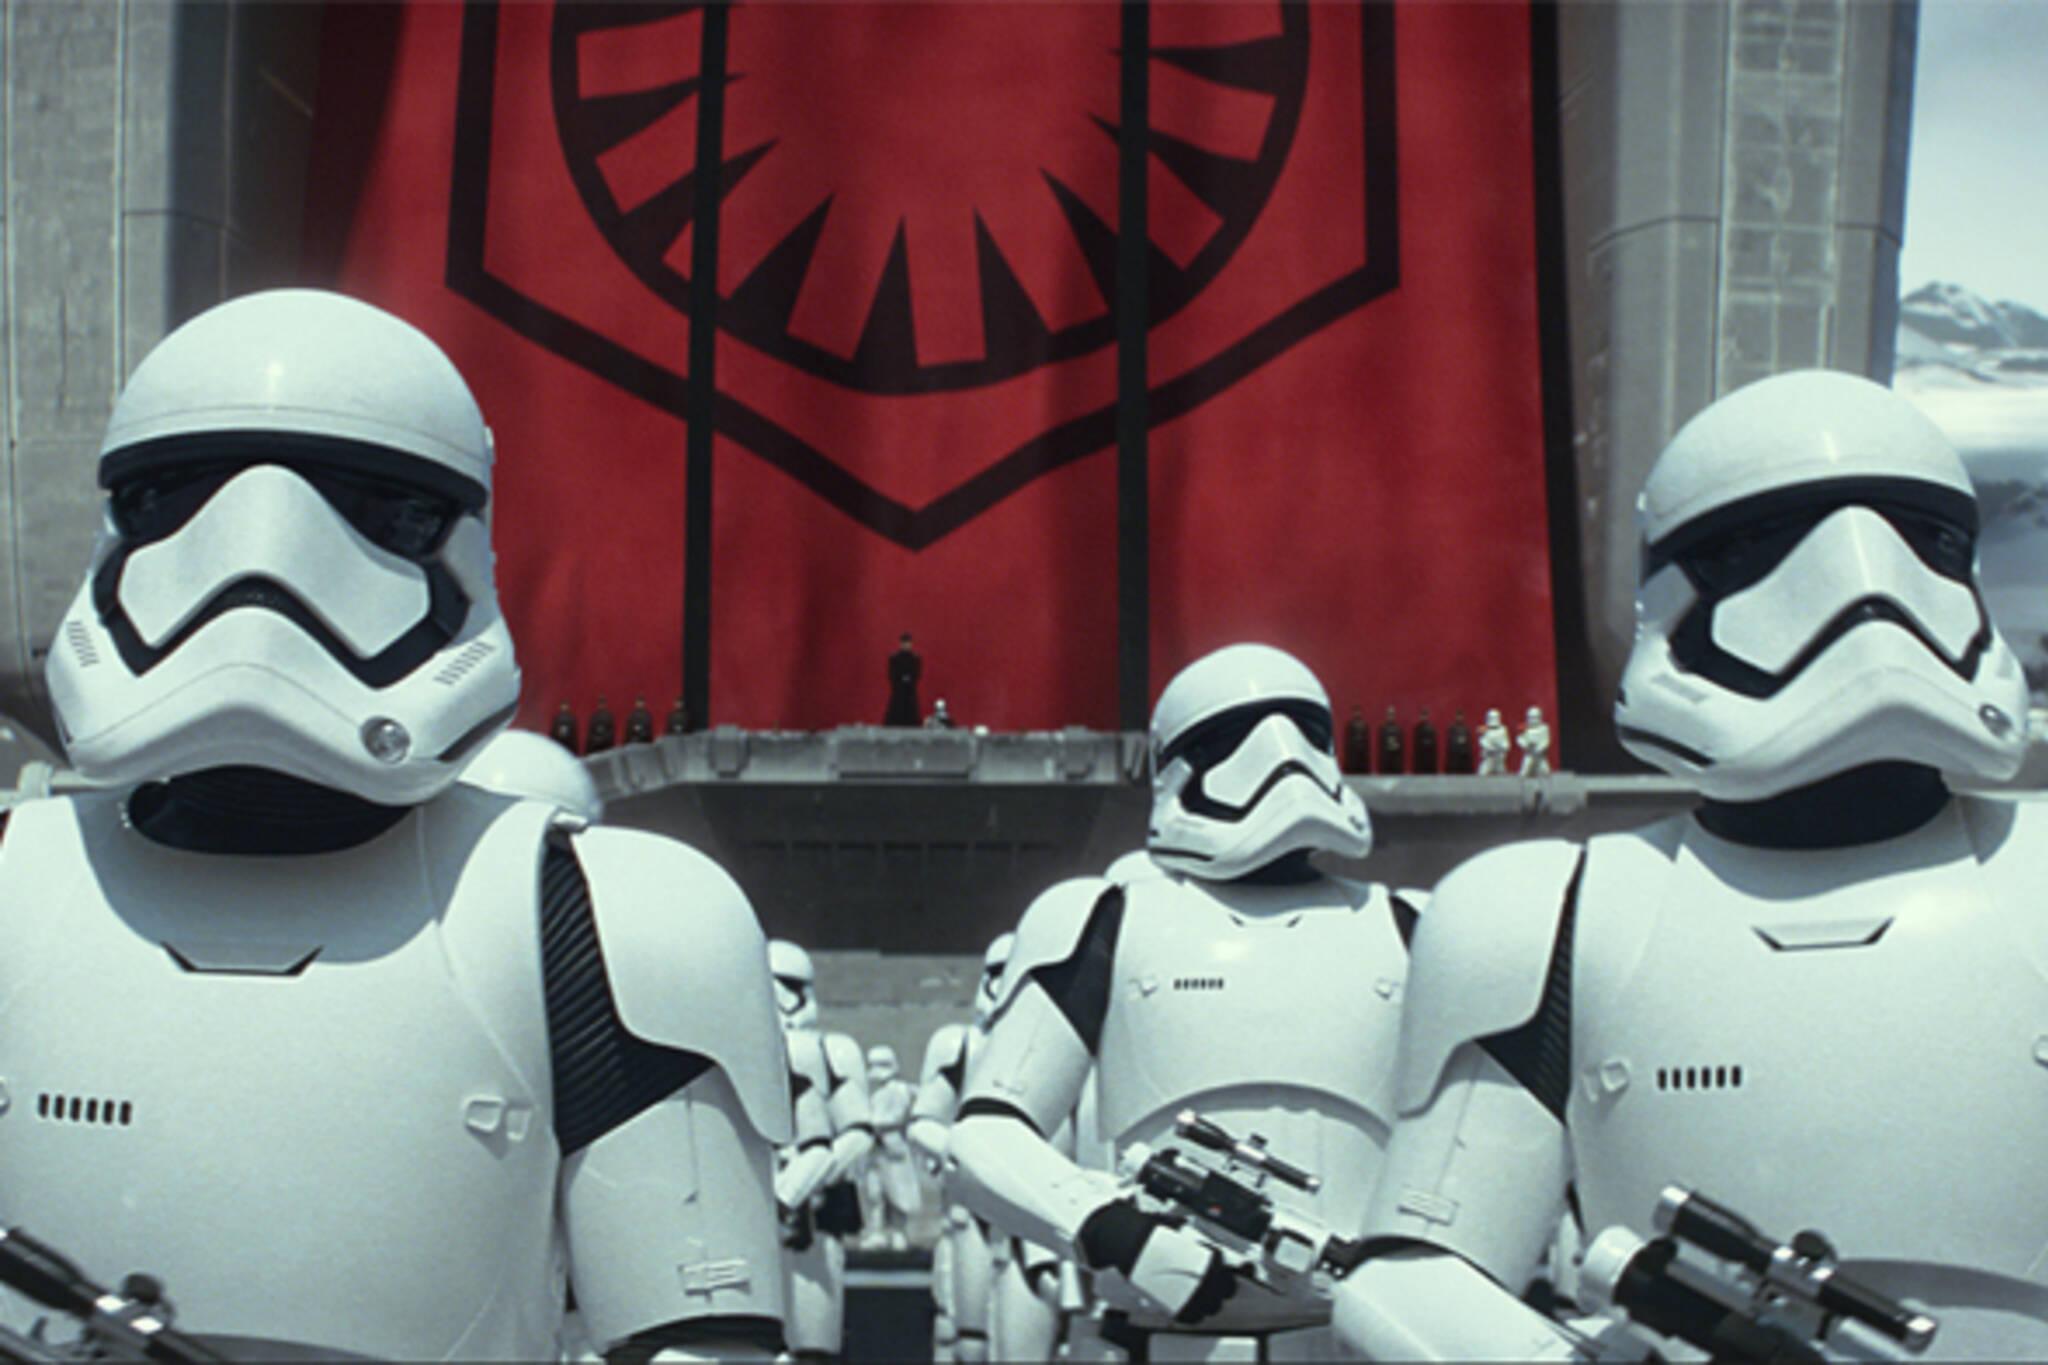 star wars toronto